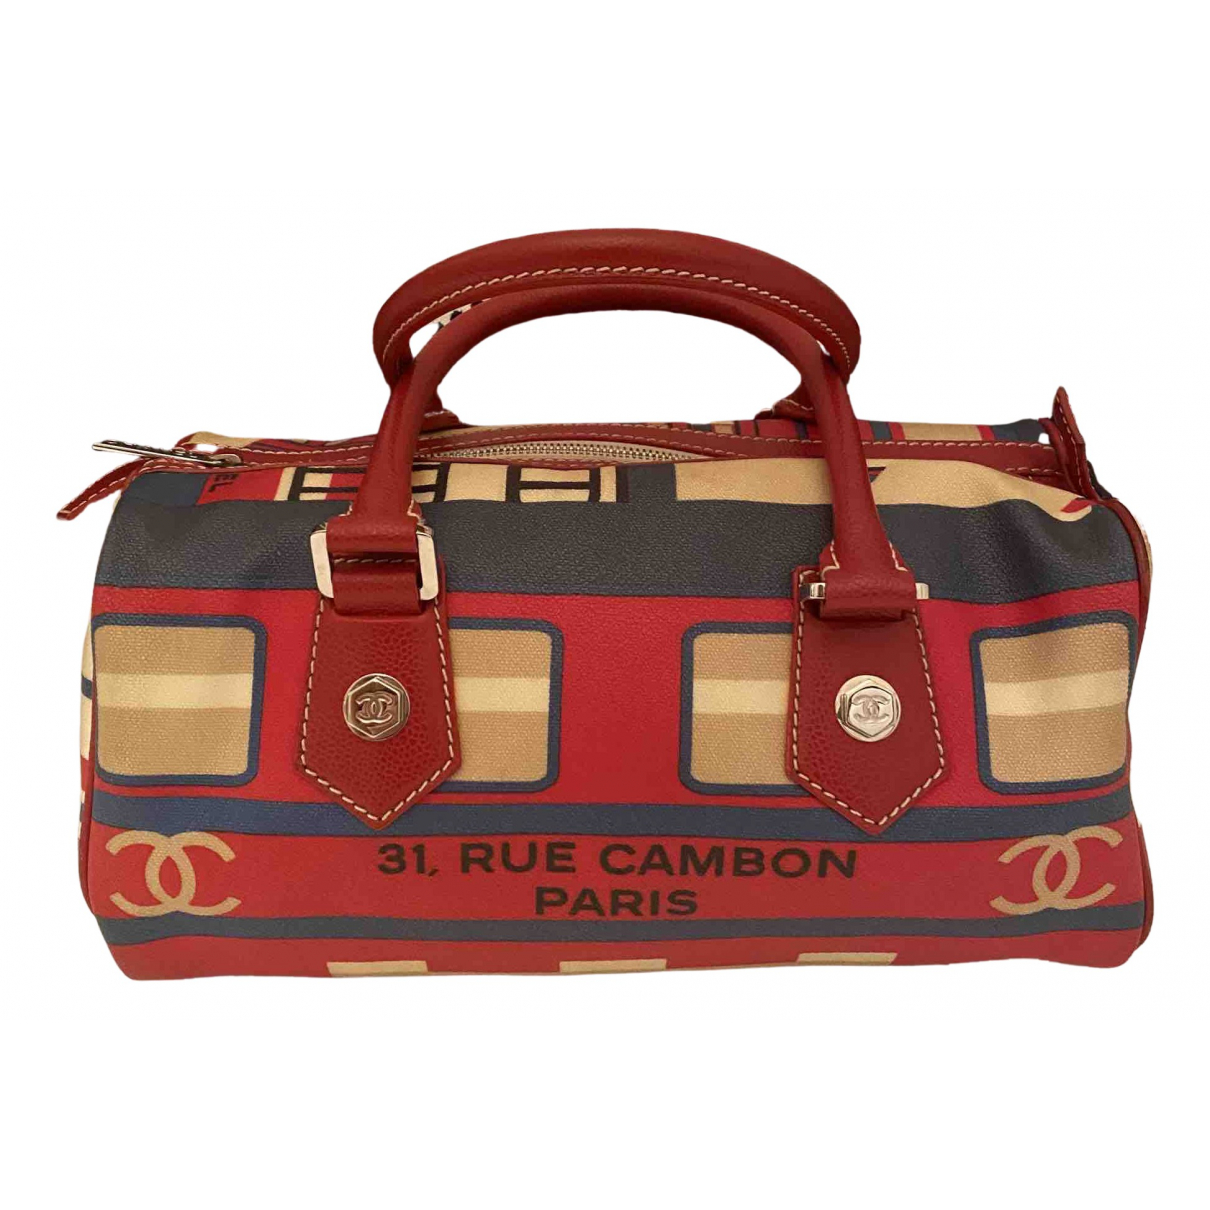 Chanel \N Red Cloth handbag for Women \N